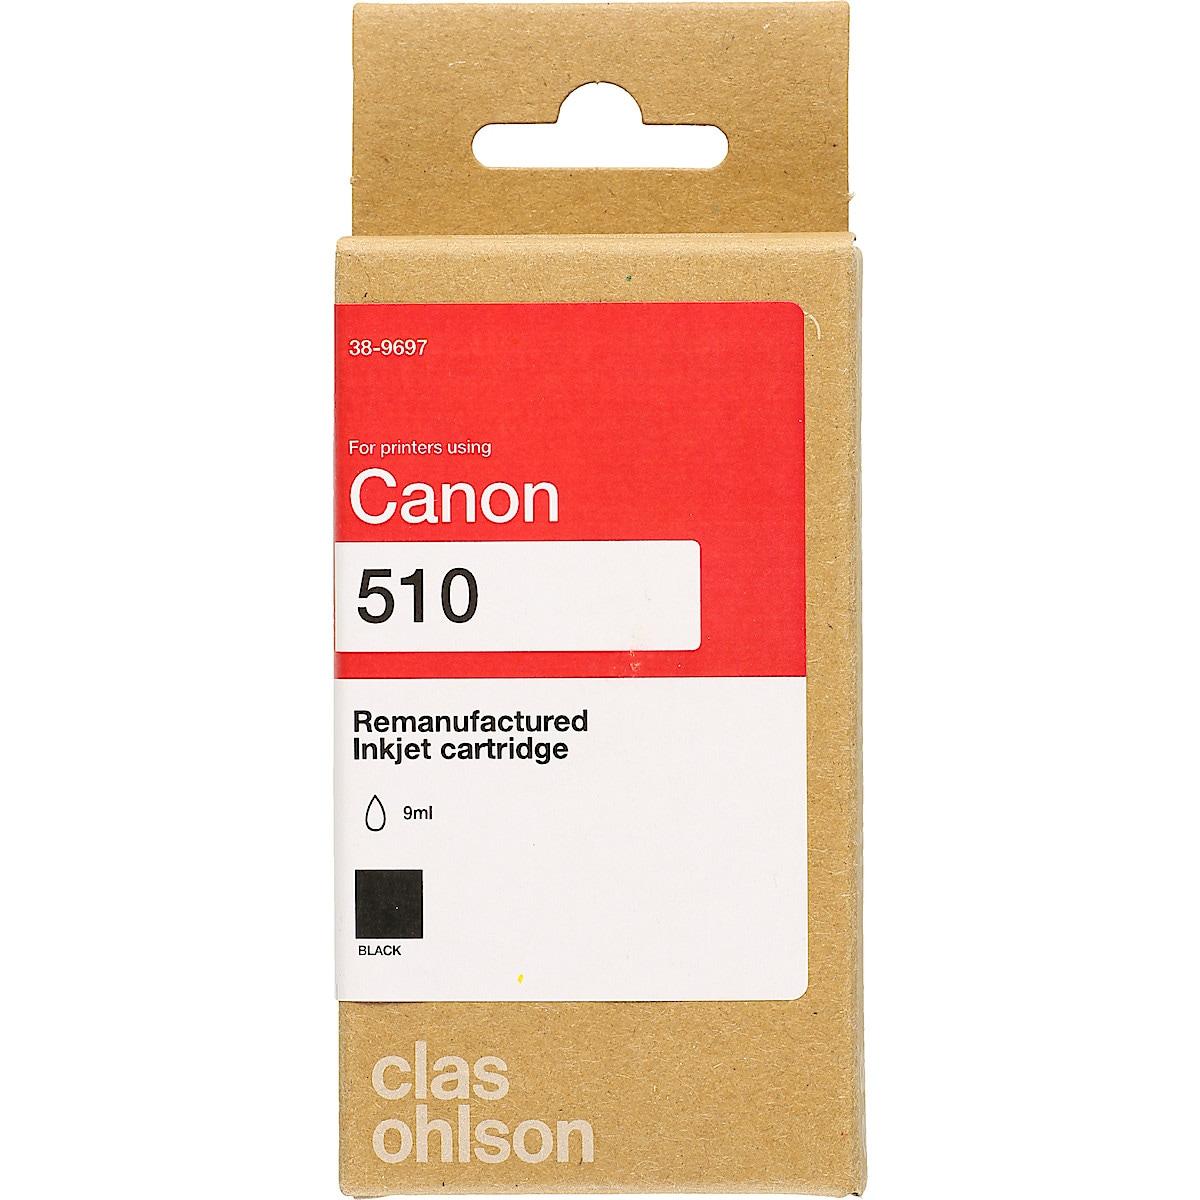 Canon PG-510 / CL511 Mustekasetti XL, Clas Ohlson